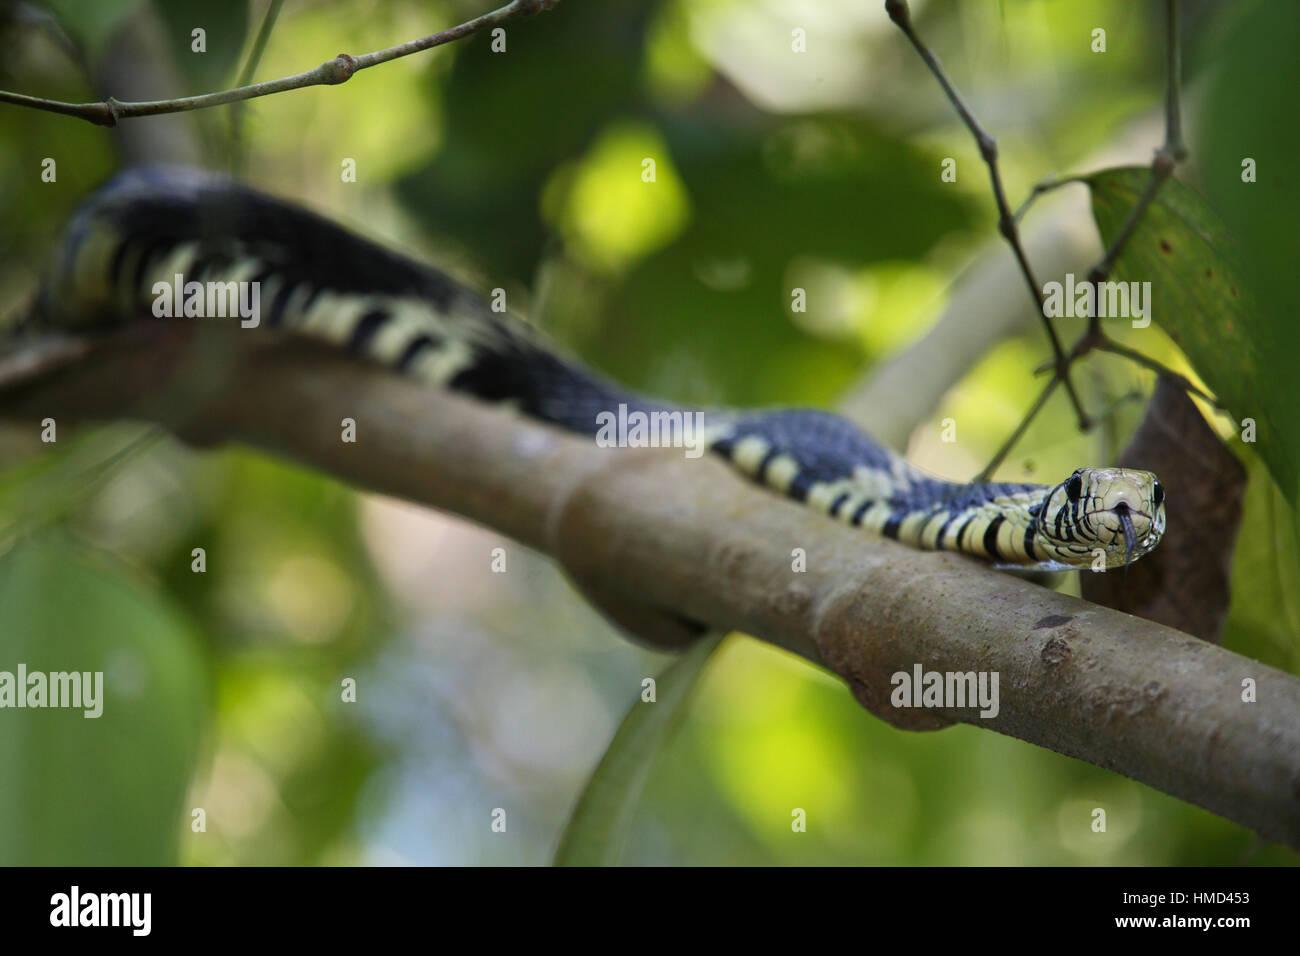 Tiger Rat Snake (Spilotes pullatus) in rainforest tree. Corcovado National Park, Osa Peninsula, Costa Rica. - Stock Image